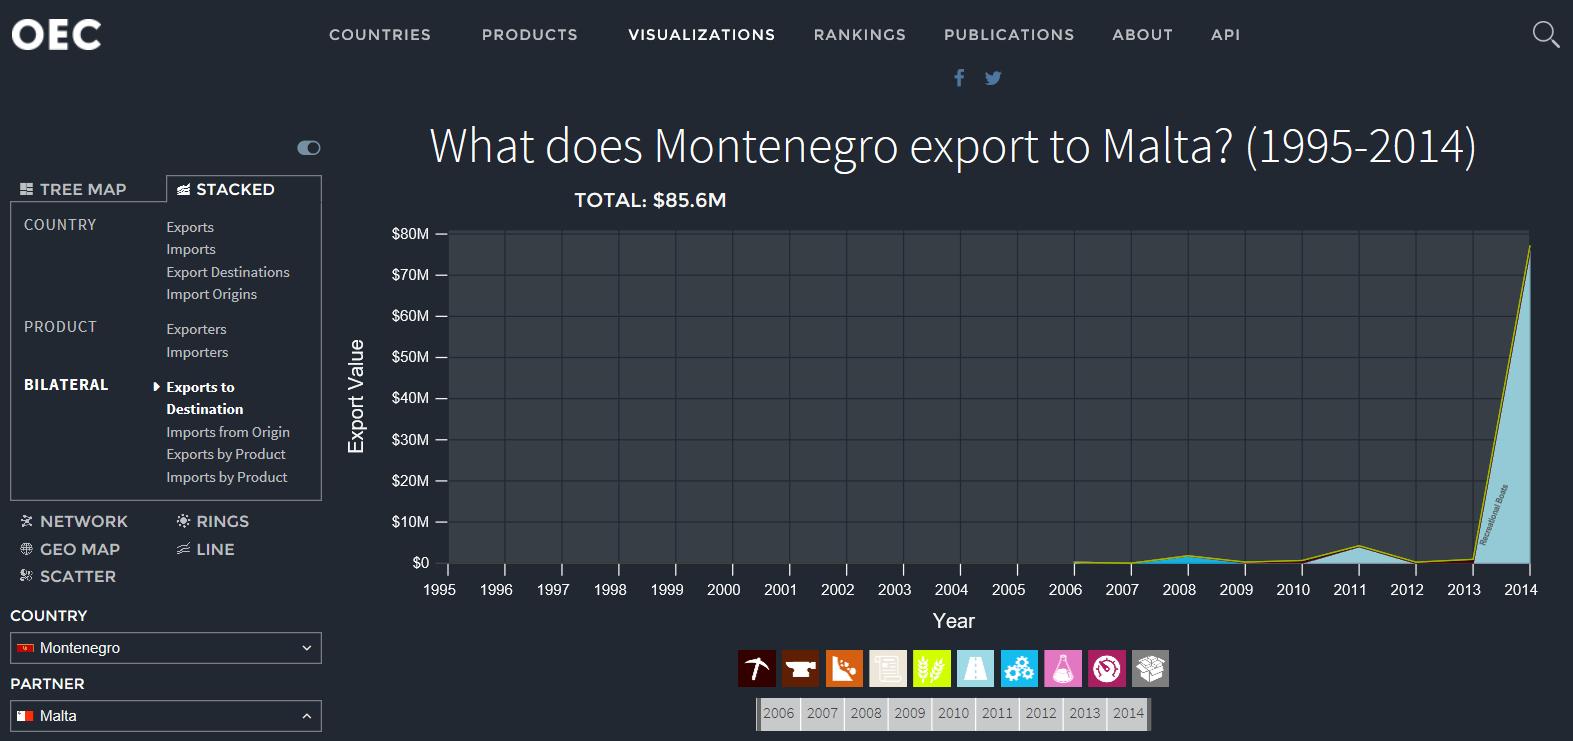 montenegro-exports-to-malta